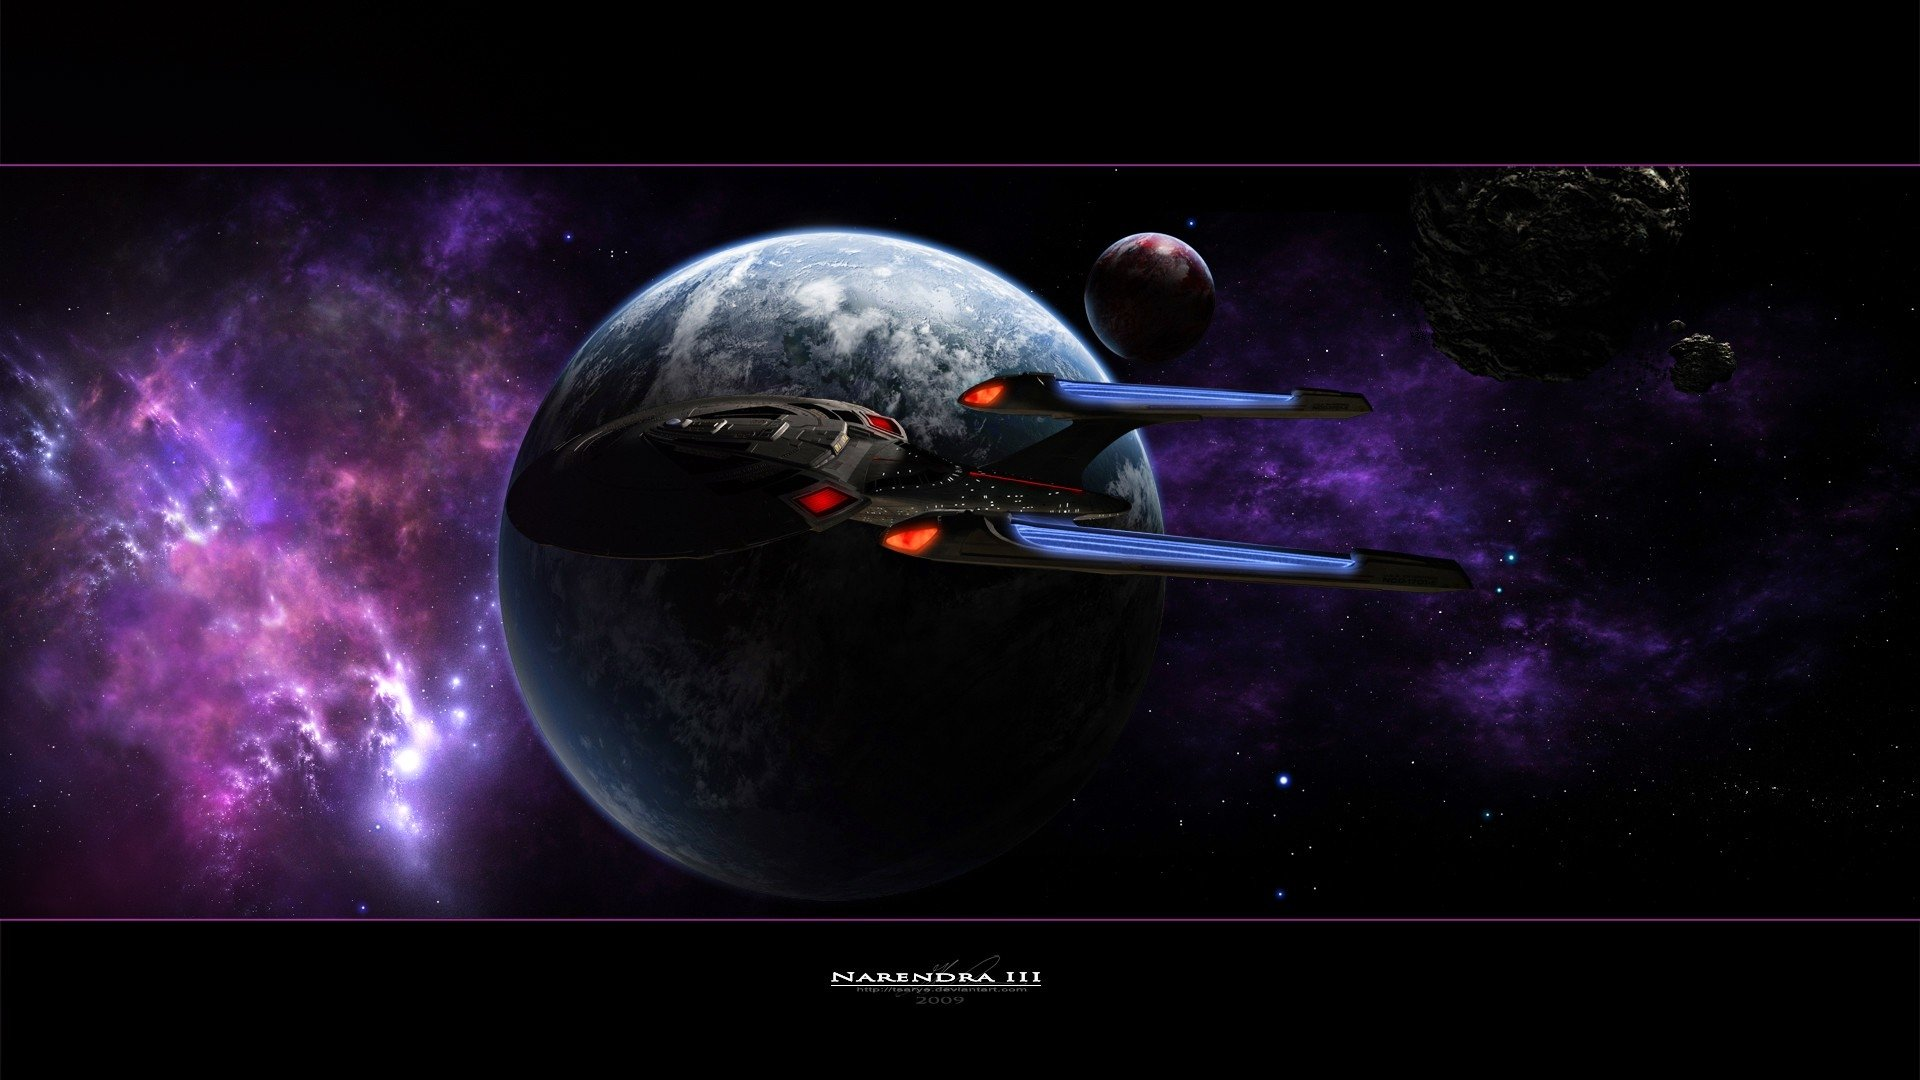 Iphone 5 Wallpaper Star Trek Star Trek The Original Series Hd Wallpaper Background